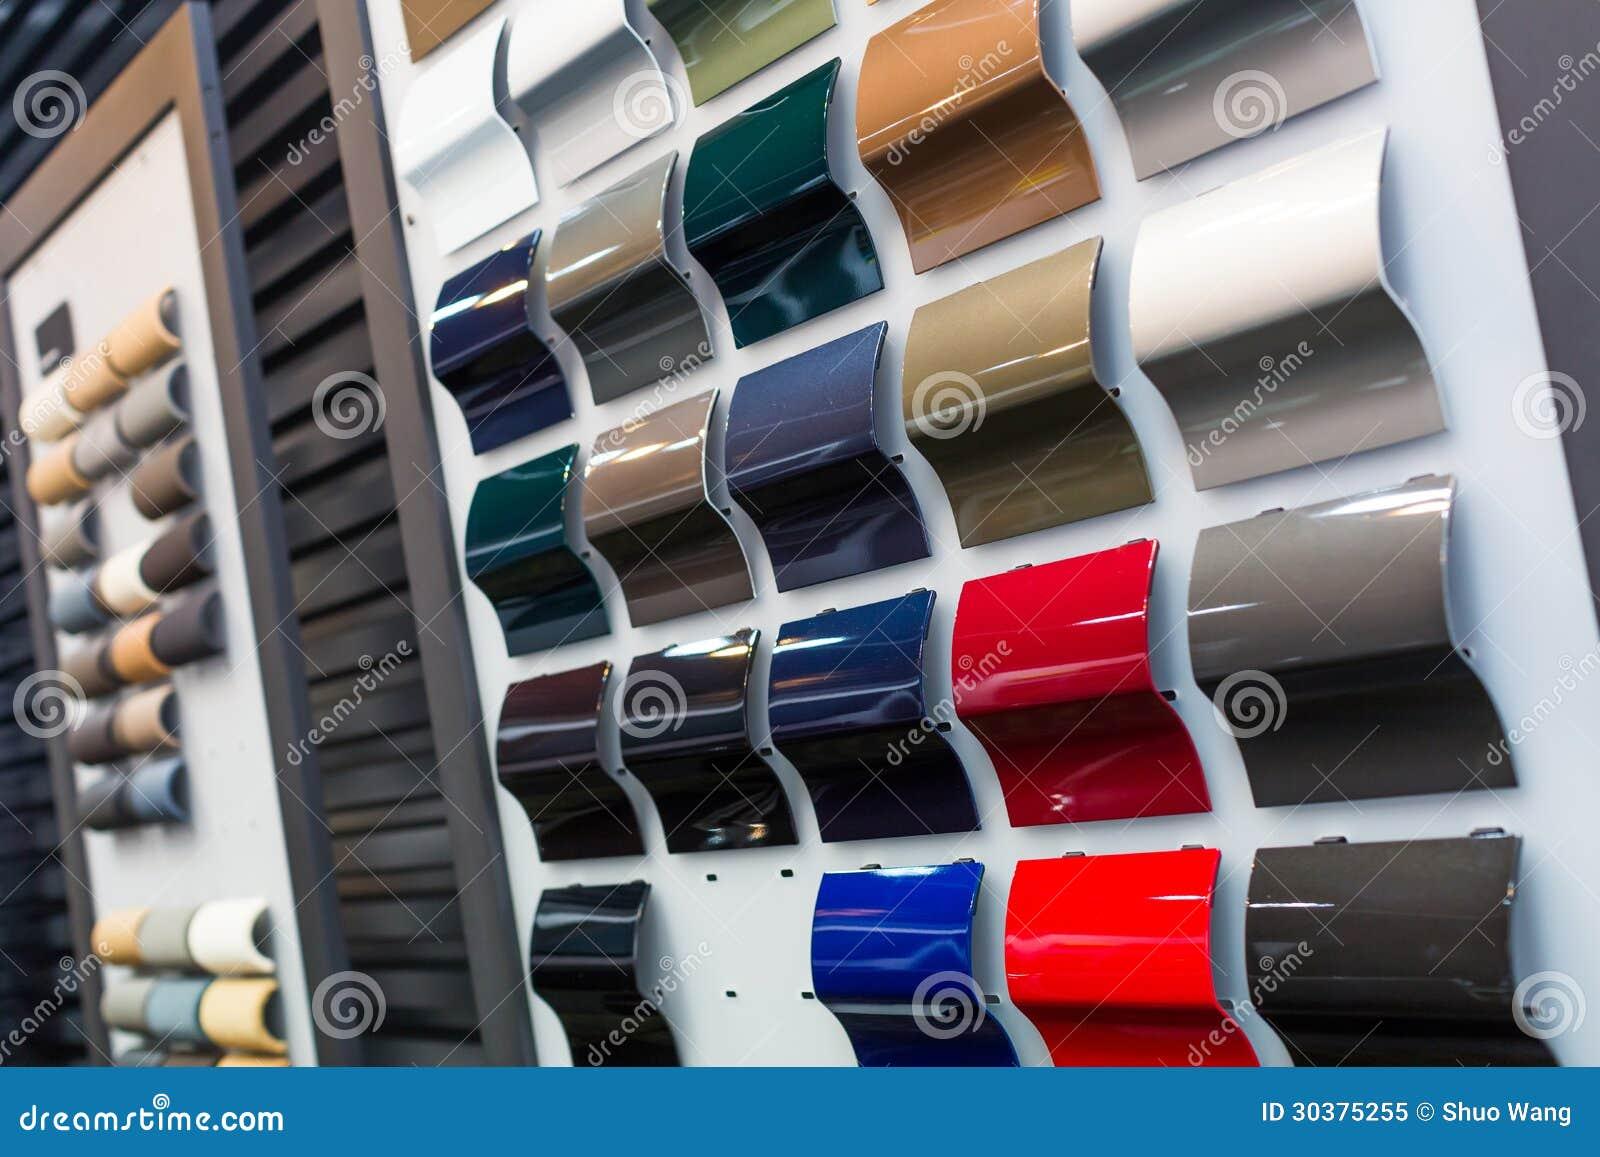 Car Paint Samples Royalty Free Stock Photo Image 30375255